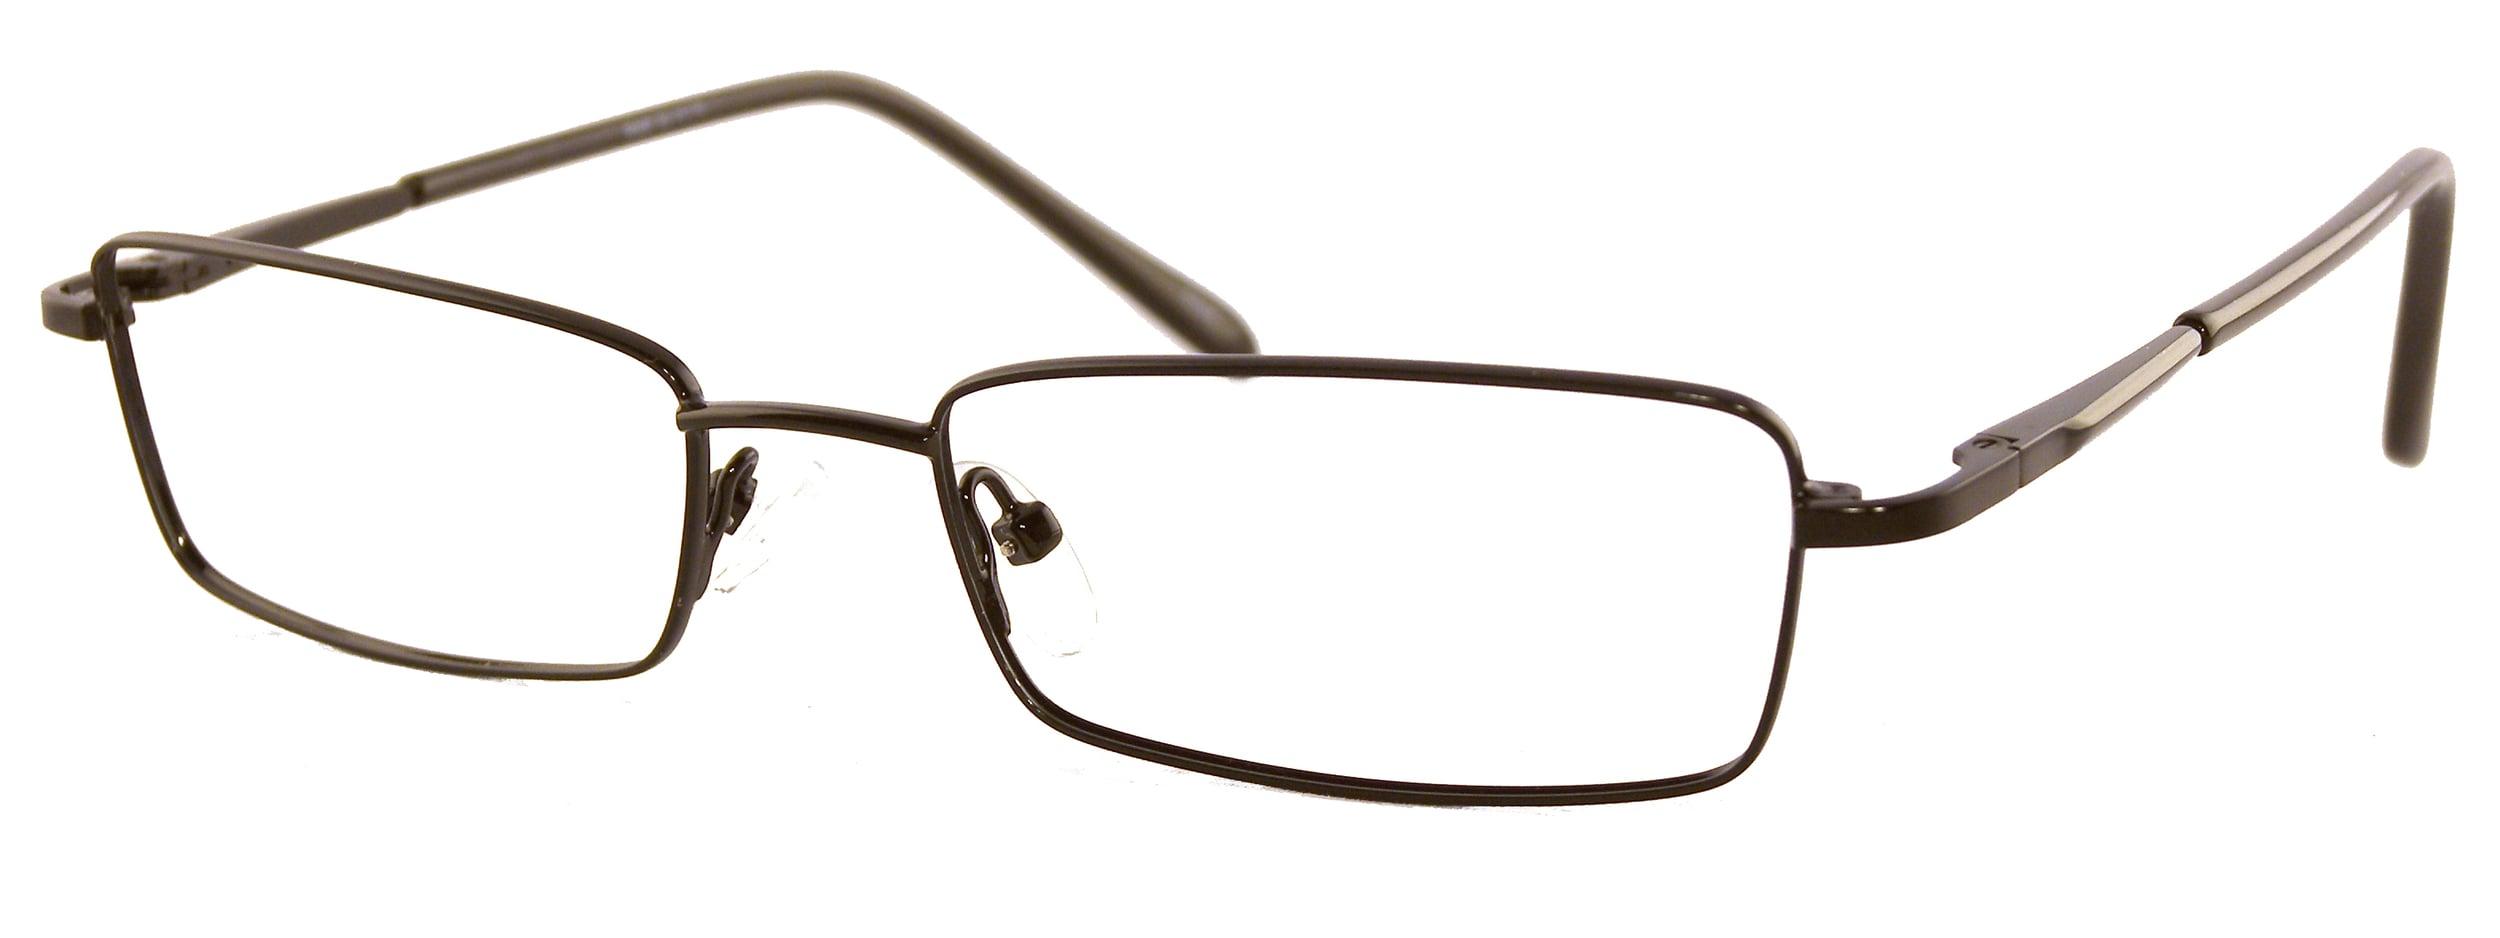 VP-138:  52-19-140 Available in Brown, Black or Gunmetal